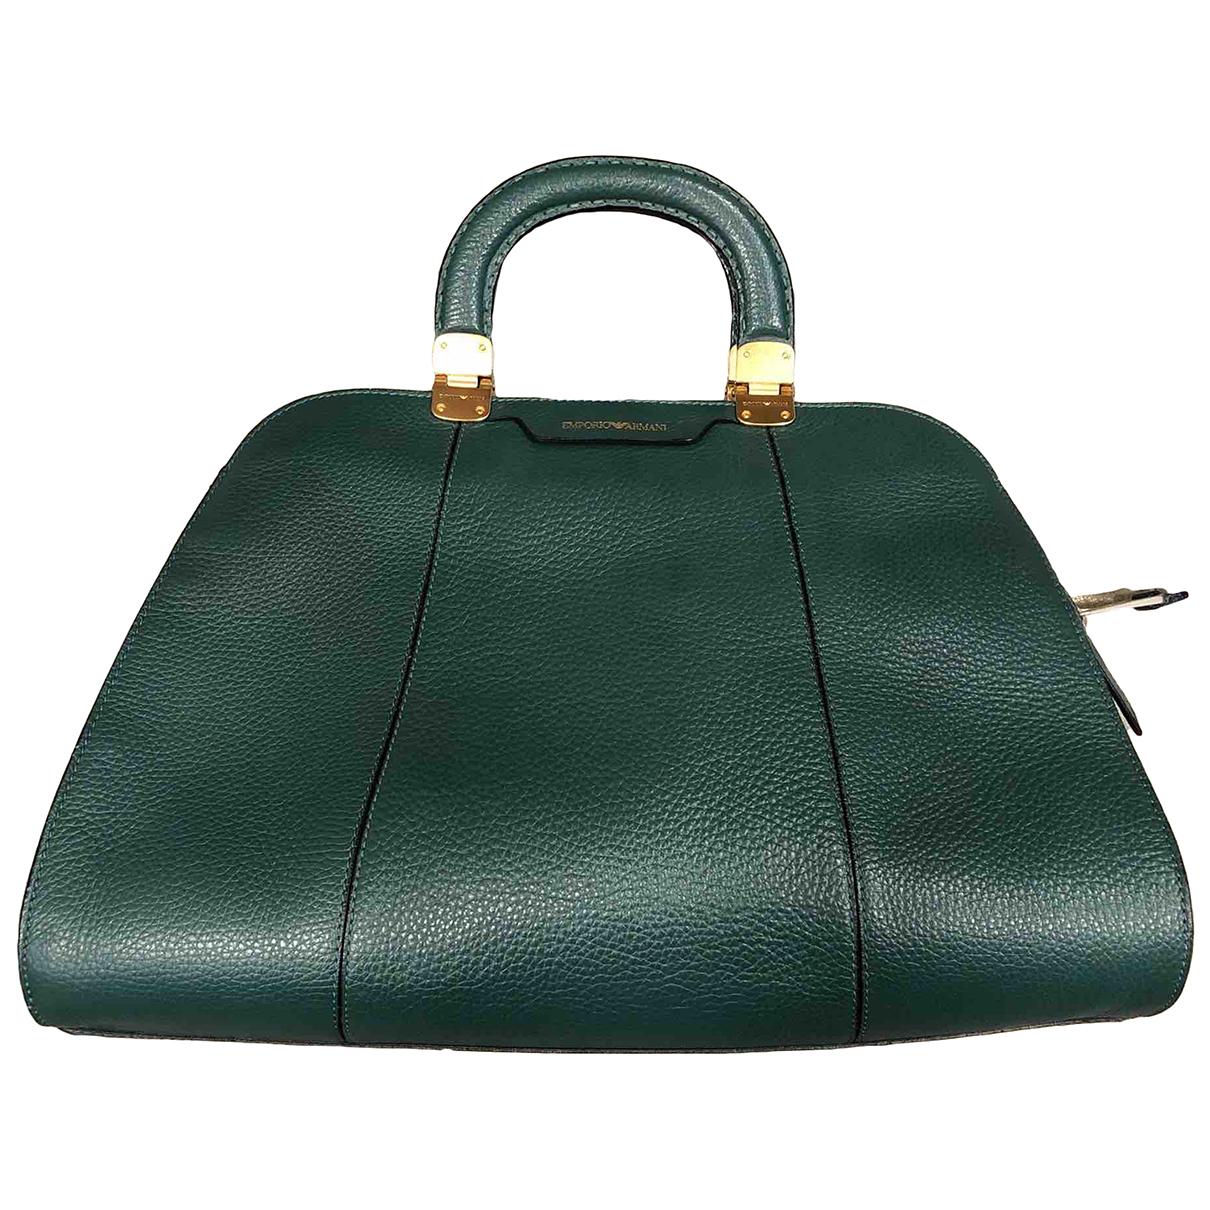 Emporio Armani N Green Leather handbag for Women N